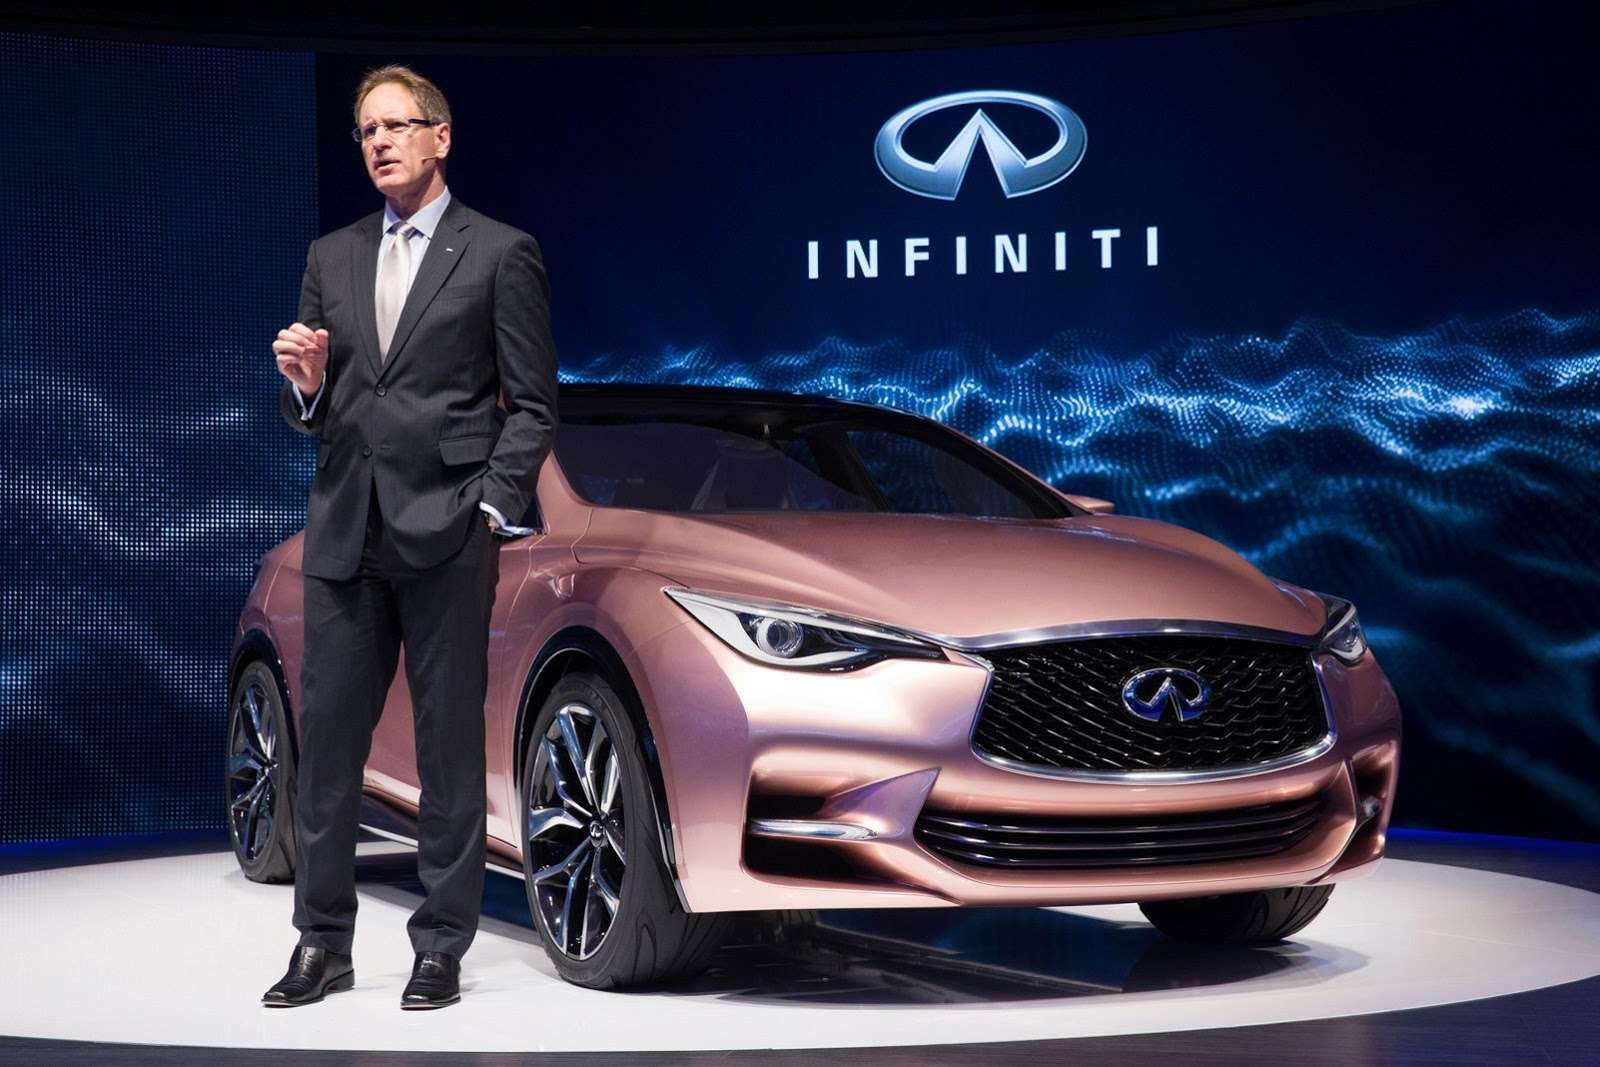 Johan de Nysschen, President of Infiniti Motor Company Ltd., unveils new Infiniti Q30 Concept at Frankfurt Motor Show 2013,embargo till 10th september 10:30 CET